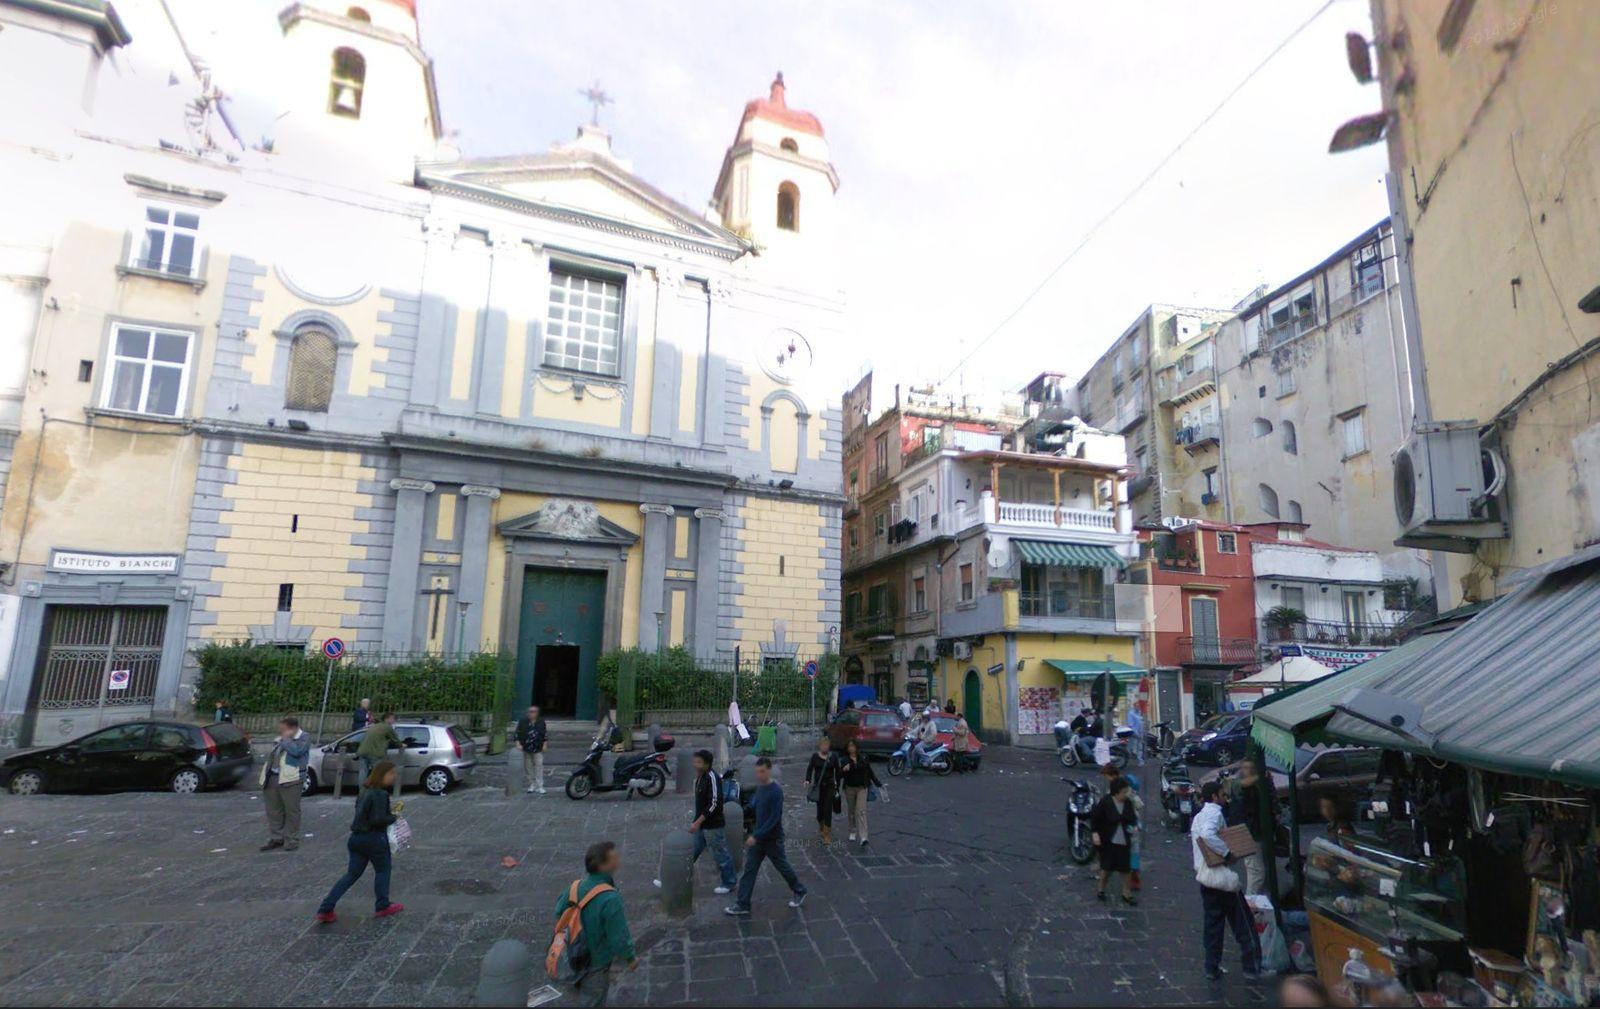 Neapel/ Piazza Montesanto